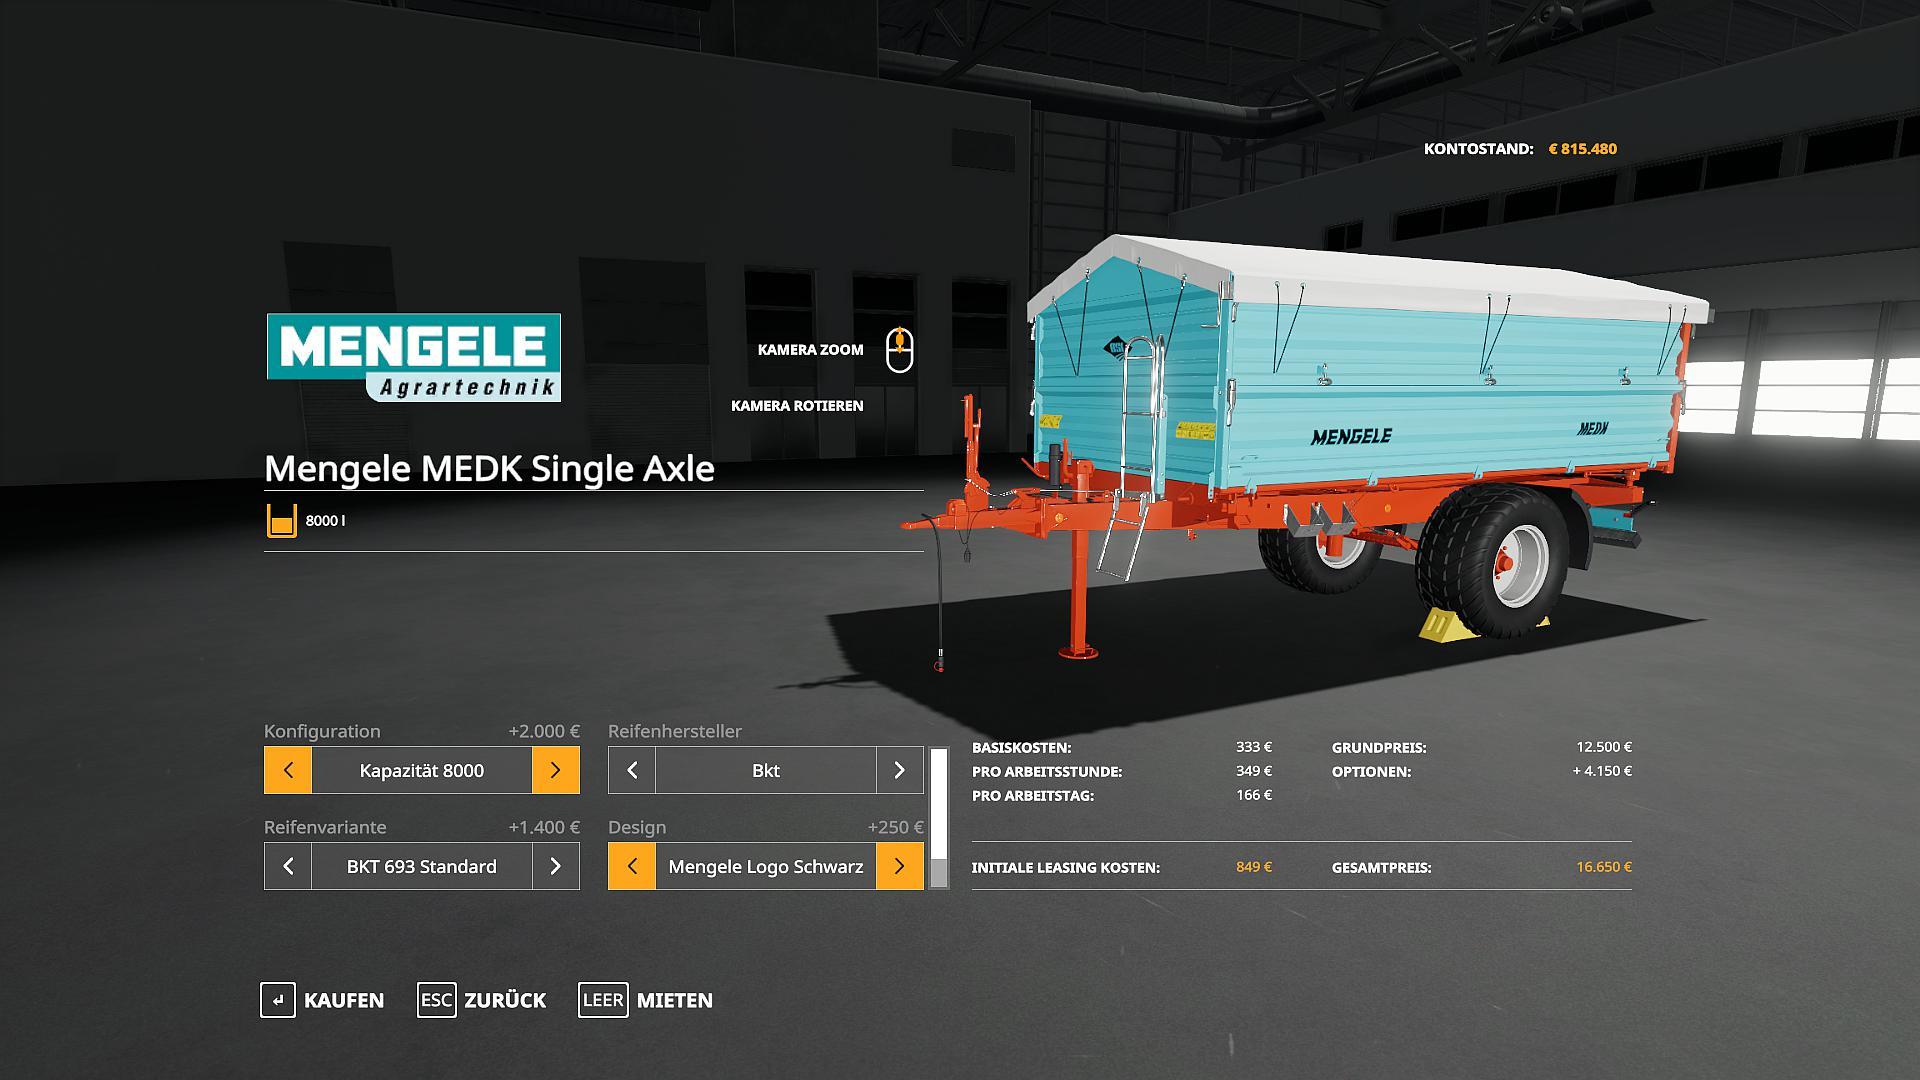 MOД MENGELE MEDK SINGLE AXLE V1.0.0.0 для Farming Simulator 2019